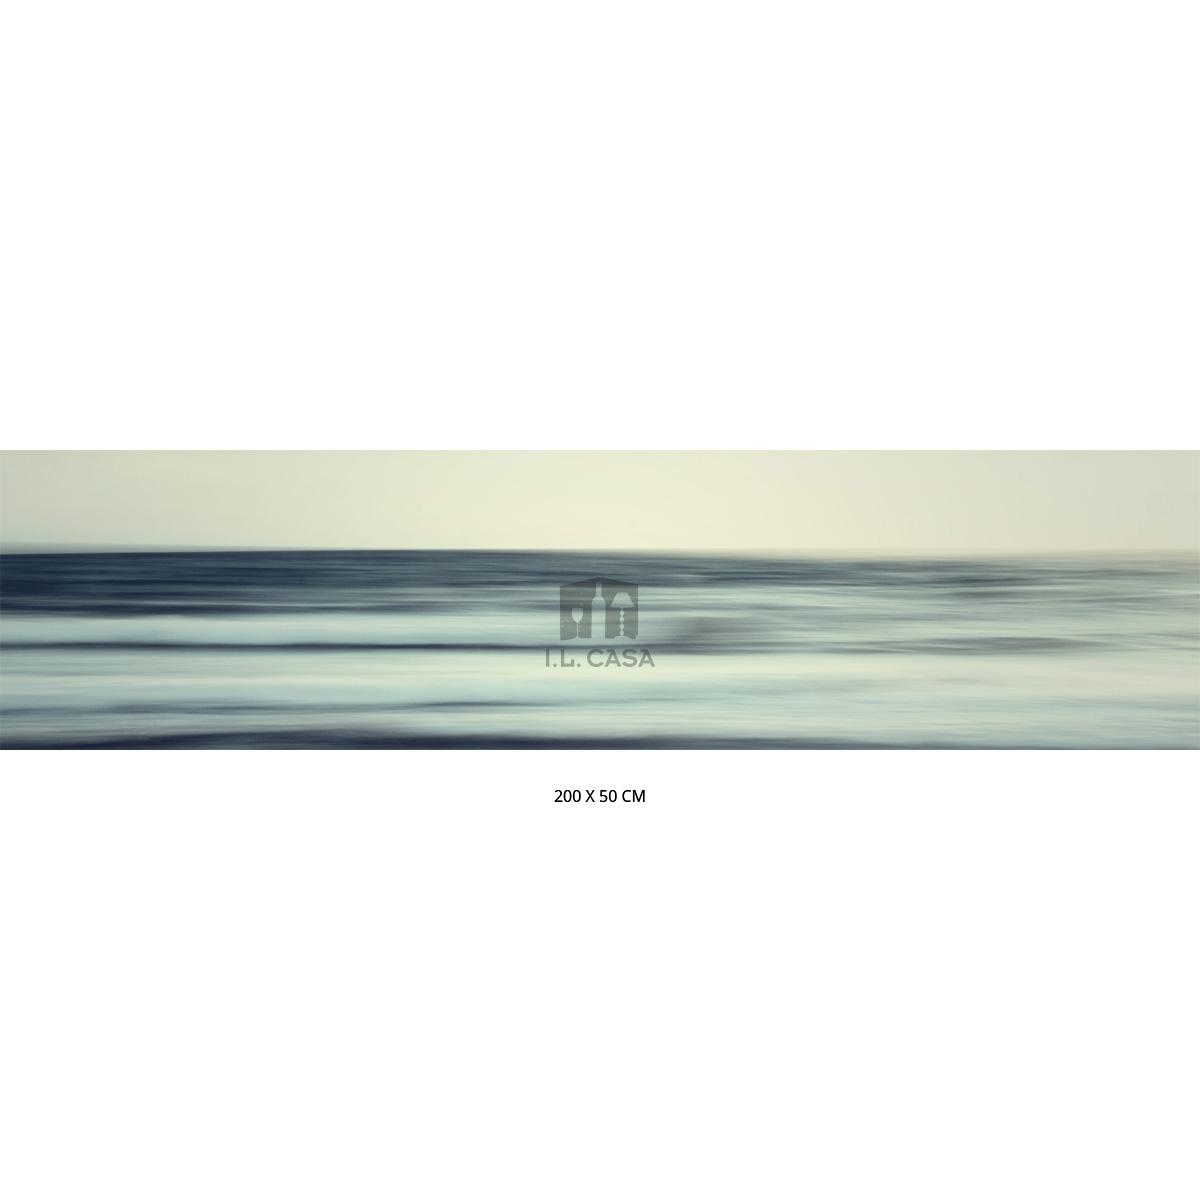 Acrylglas-Bild WASSERIMPRESSION